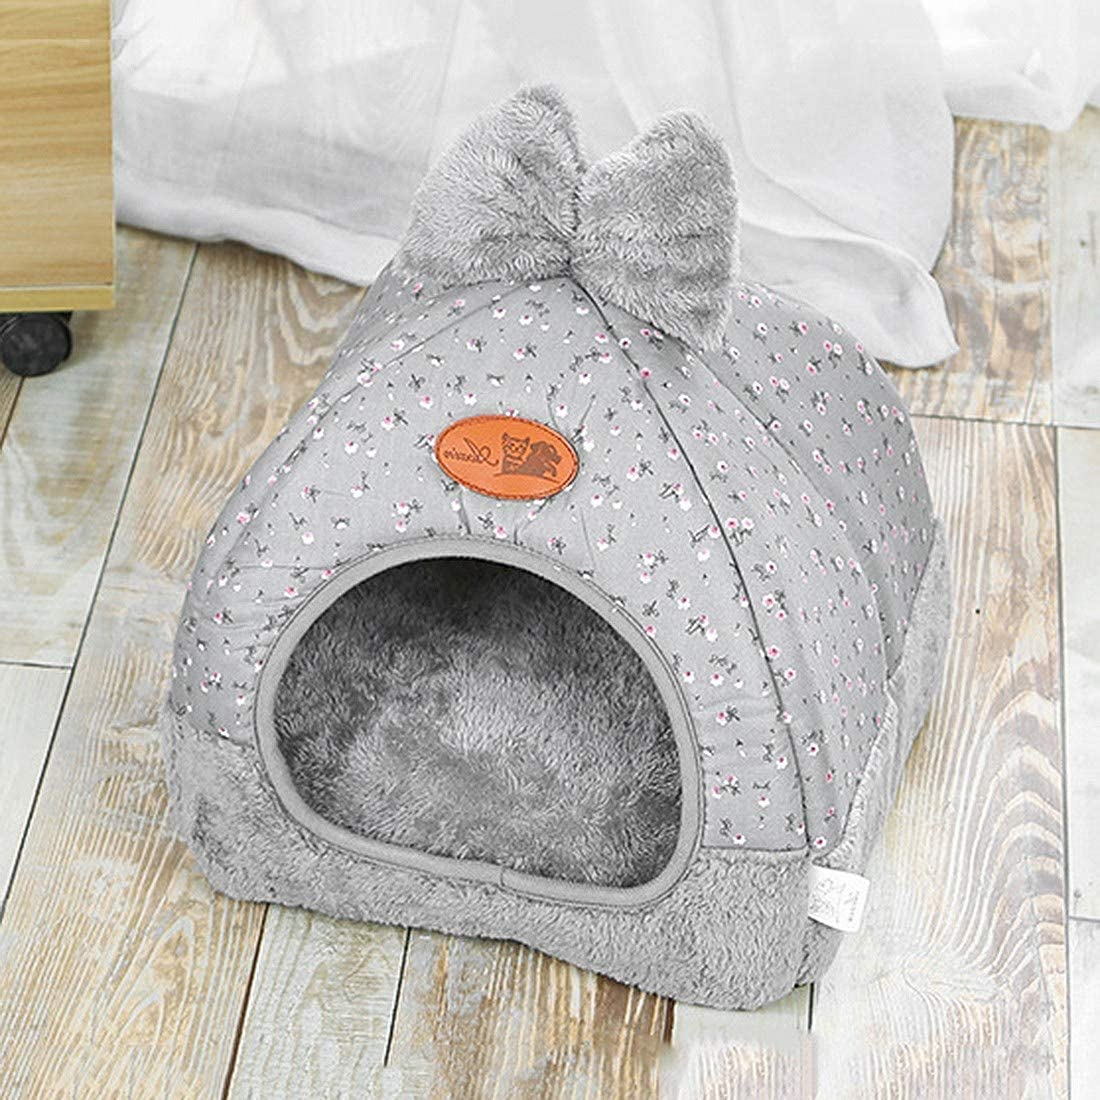 Sof/á Cama para Mascotas con Coj/ín Extra/íble Suave y C/ómodo para Dormir Nido Cueva para Mascotas Cachorros Bverionant Cama Caseta Perro Gato Interior